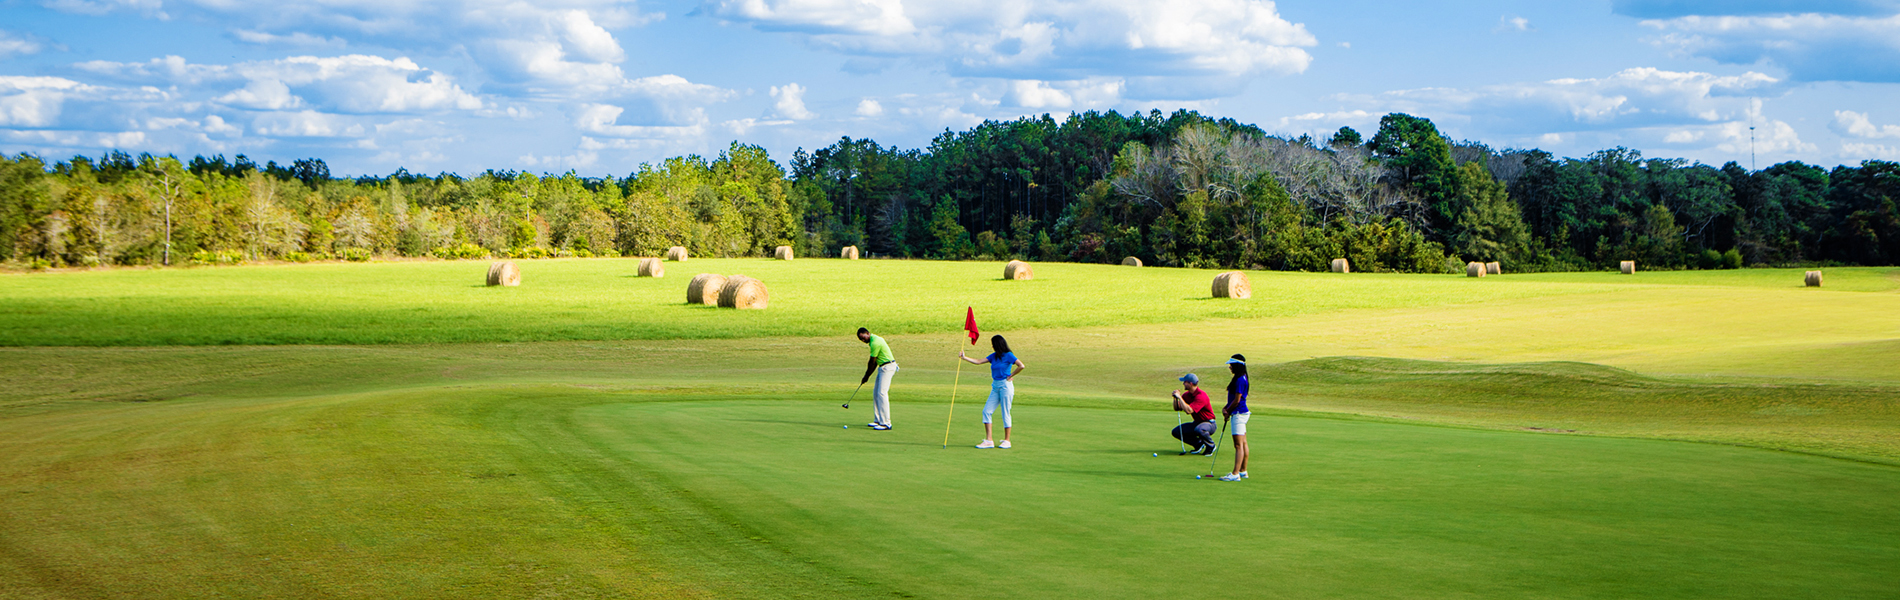 Golfing at Gordonia-Alatamaha